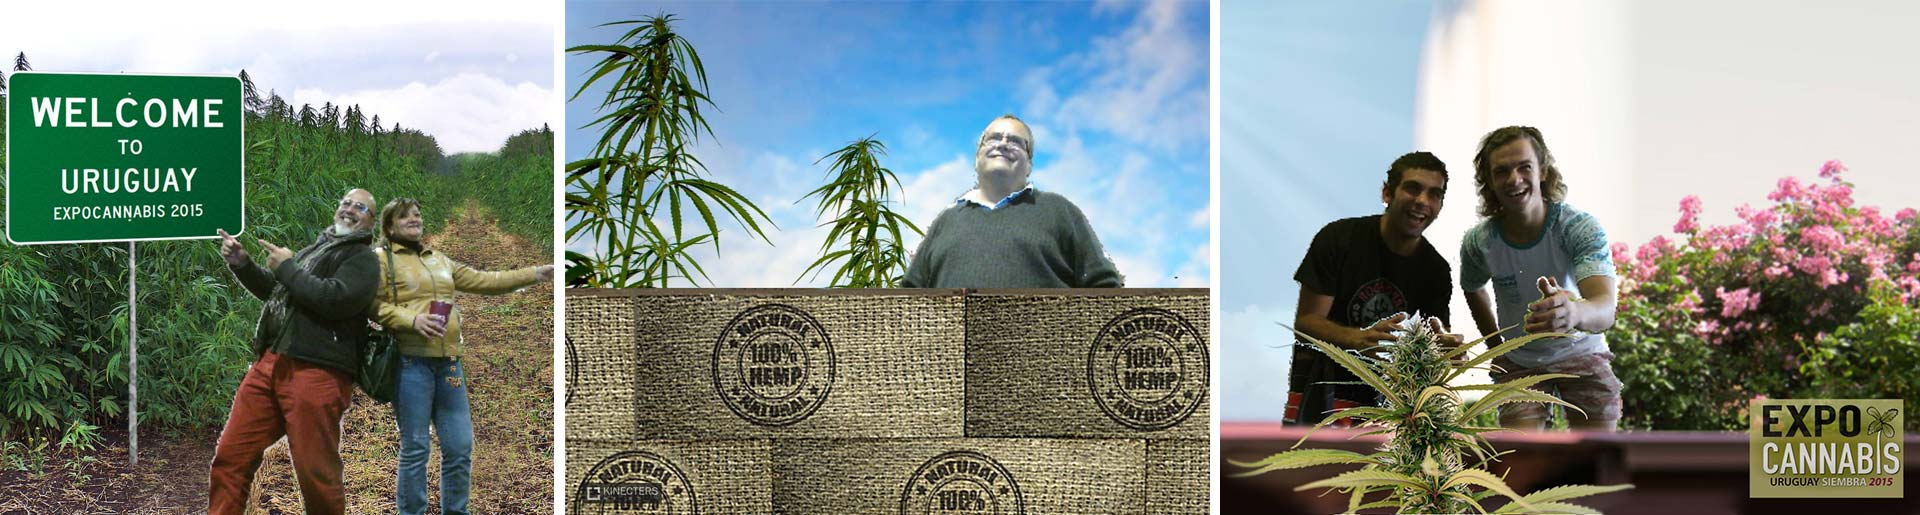 expocannabis_5_caja